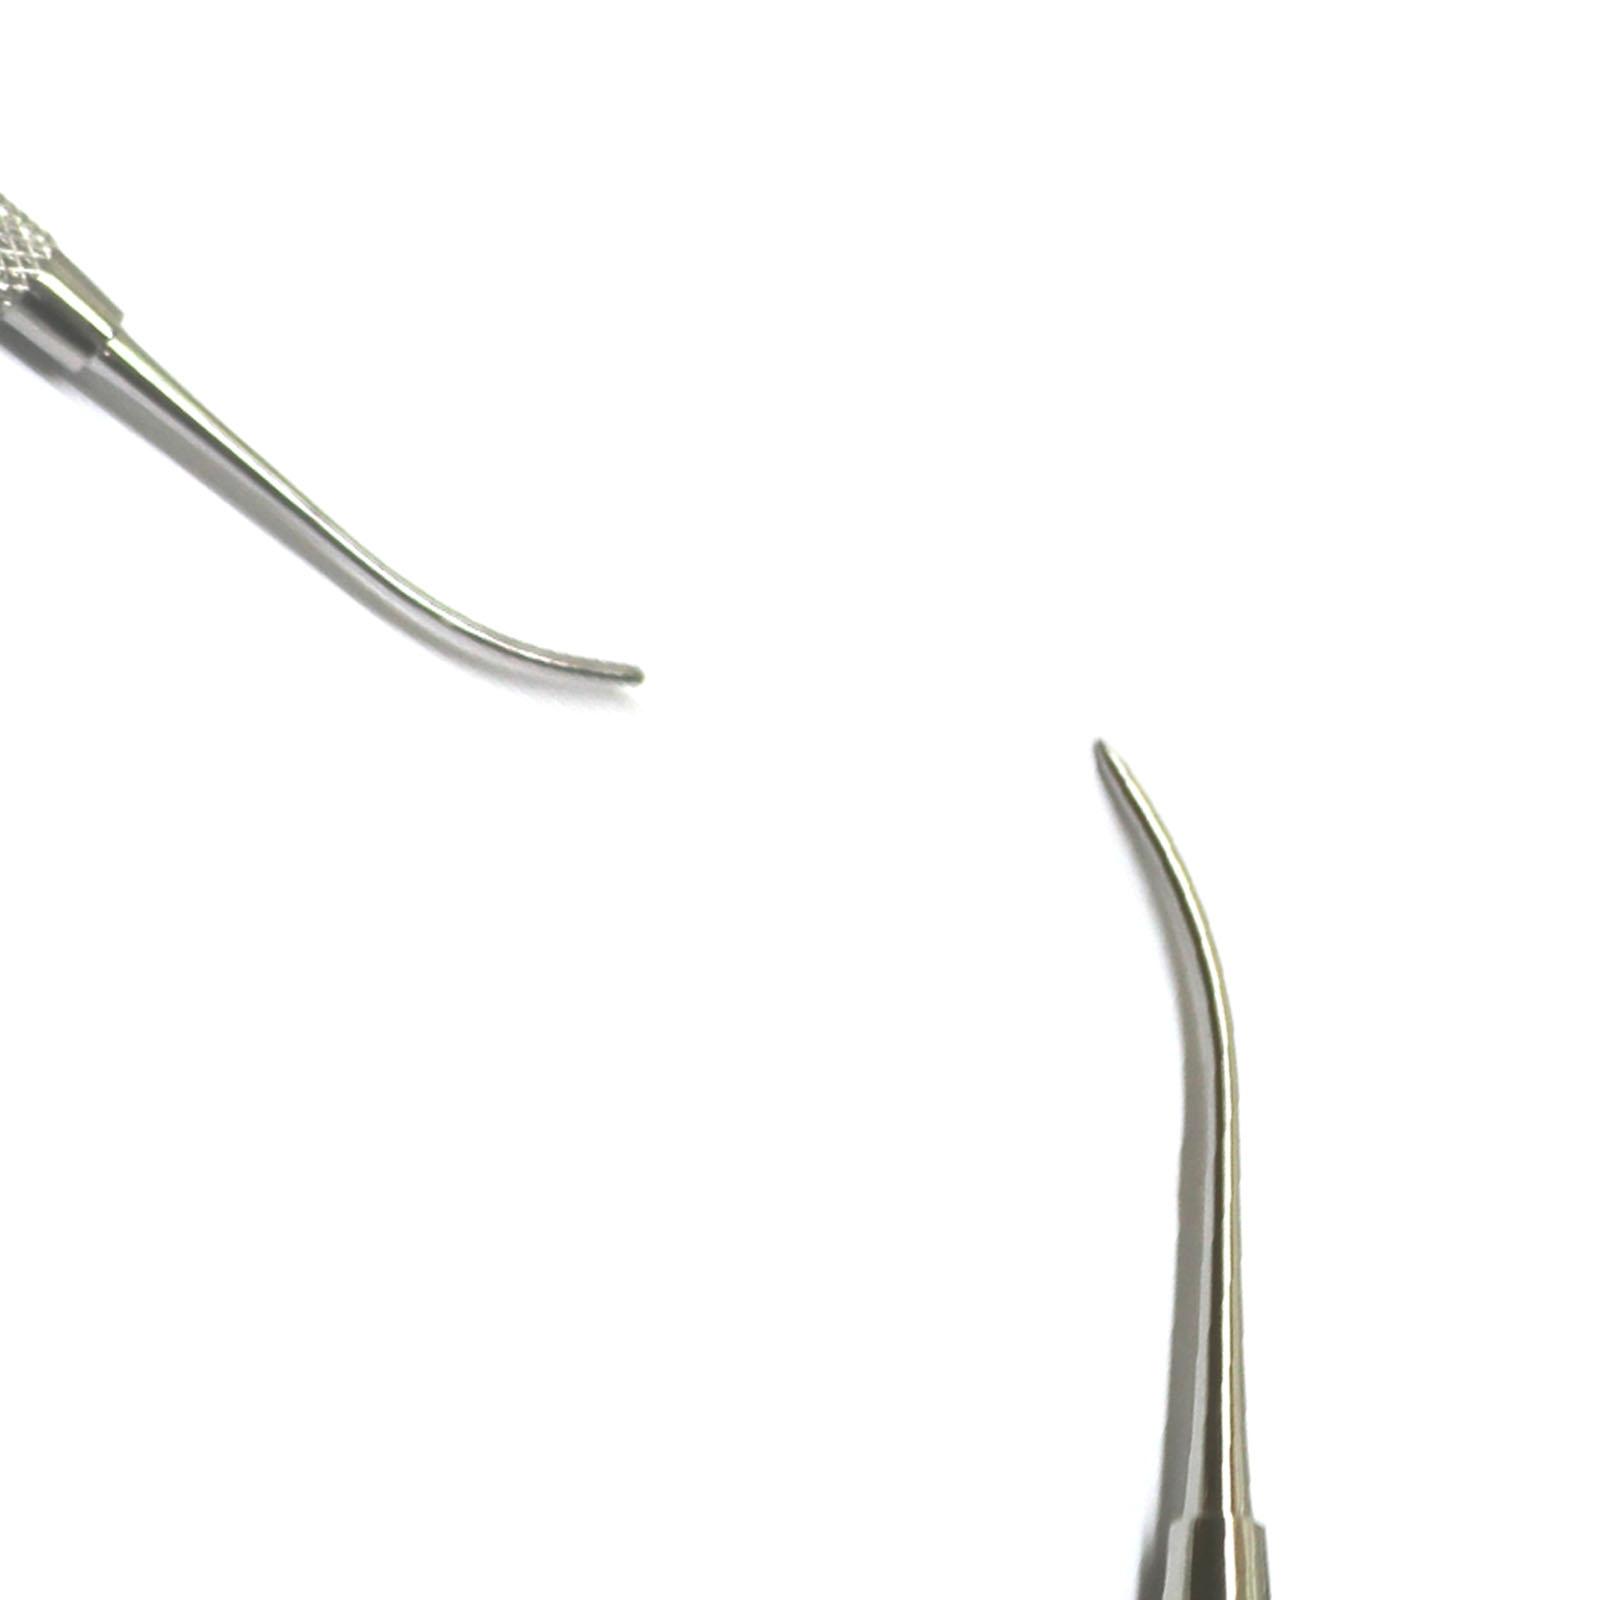 PK Thomas Restorative Carver Dental Instruments PKT2-002 | Shipshape Instruments-654